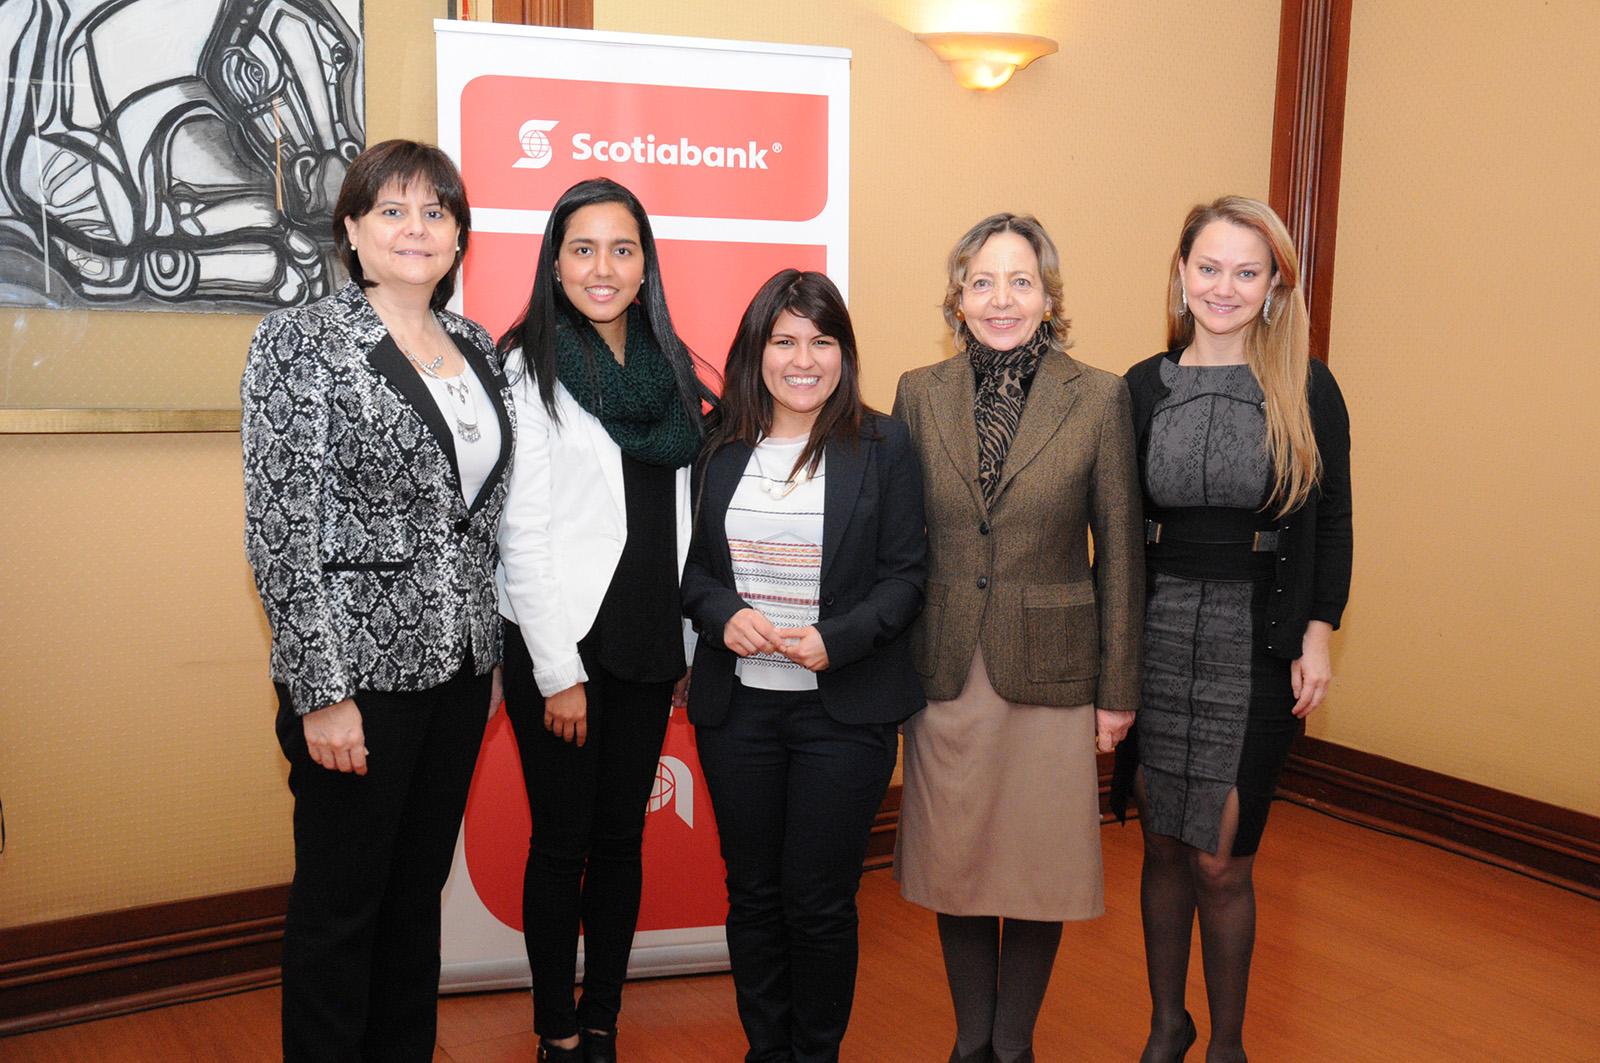 Jacqueline Balbontín, Stefany Díaz, Adriana Dominguez, Margarita Ducci, Rebecca Sarmiento